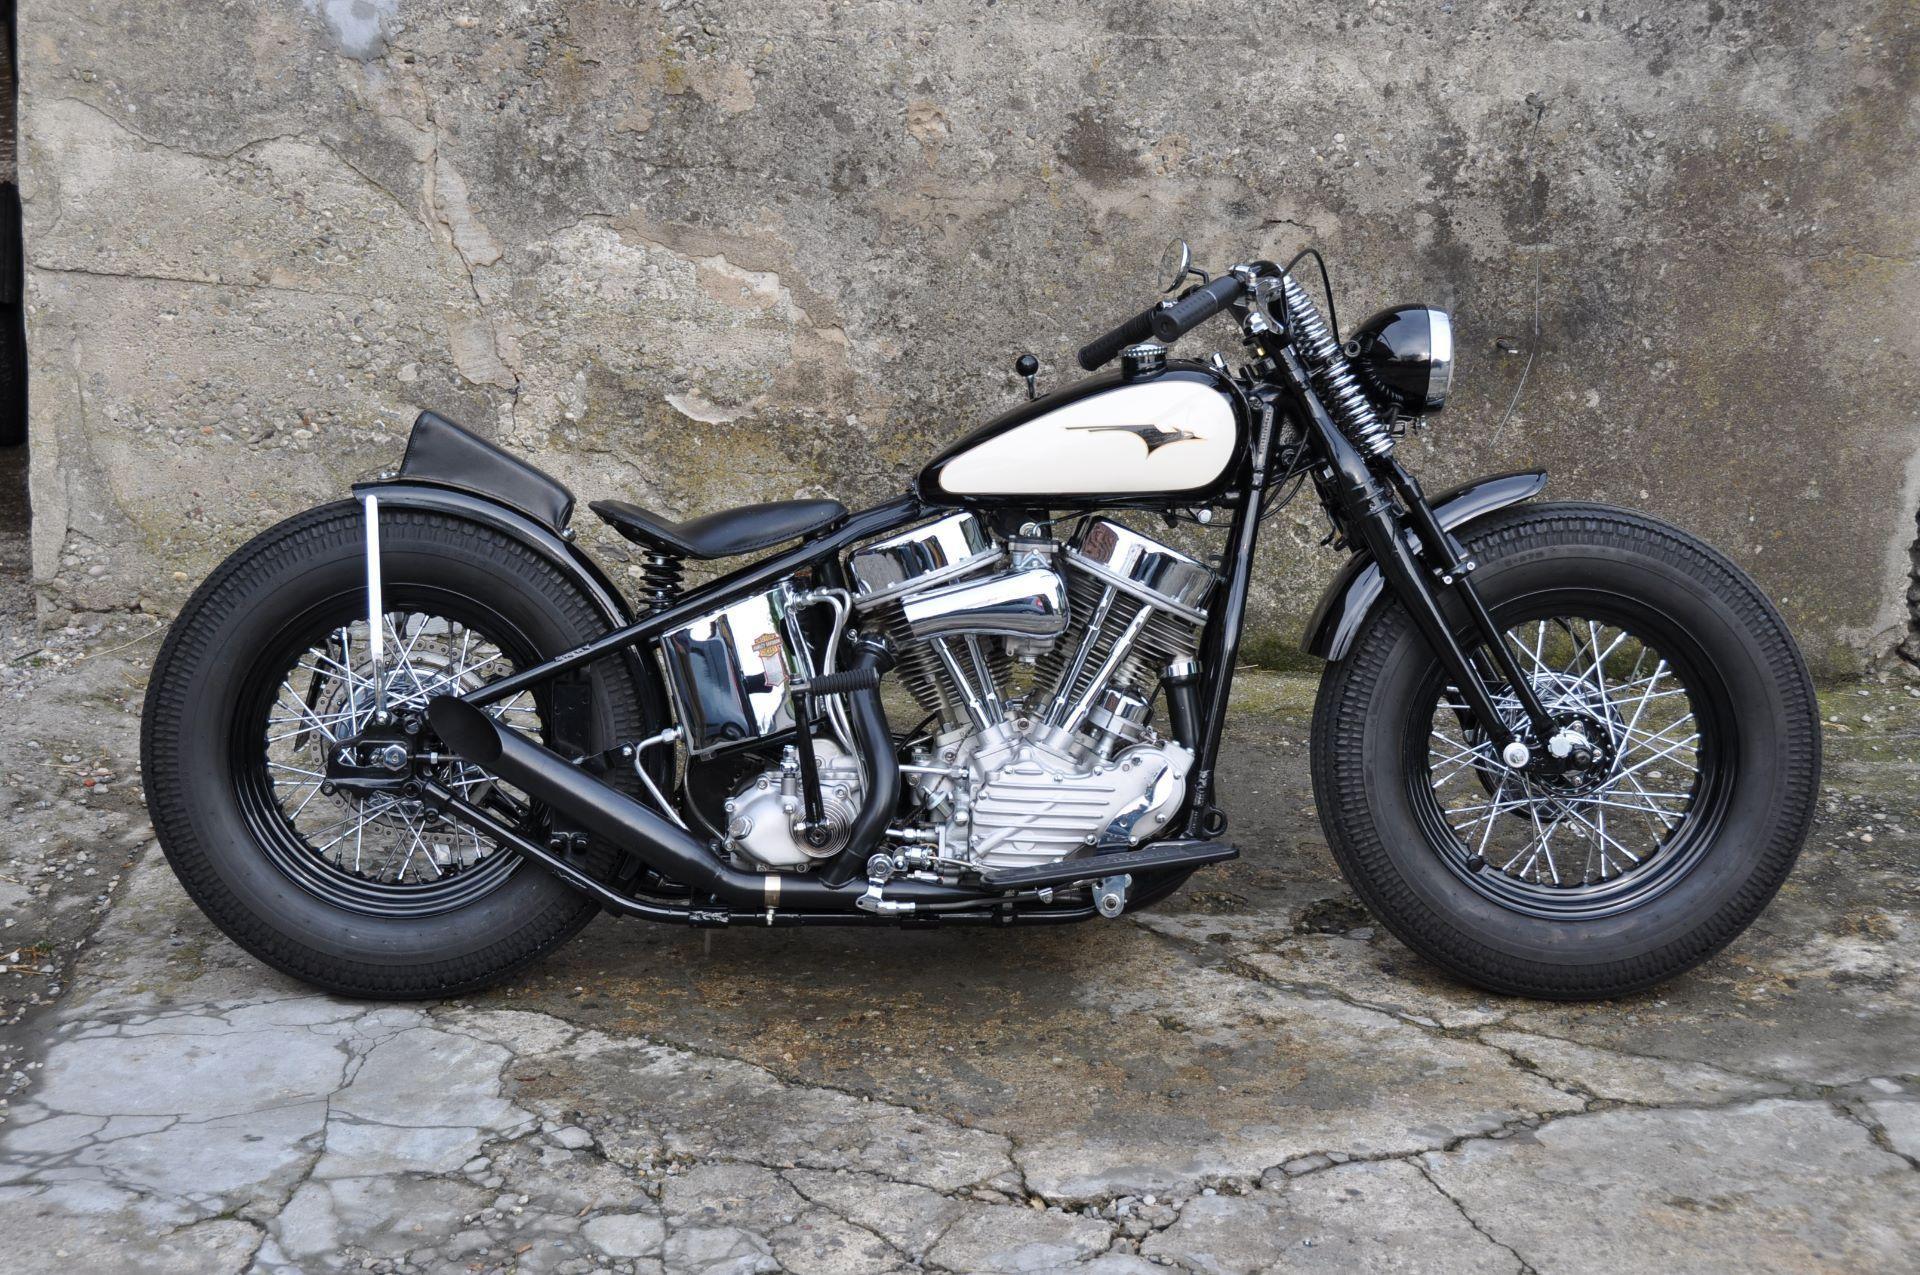 Custom Harley Davidson For Sale In Los Angeles